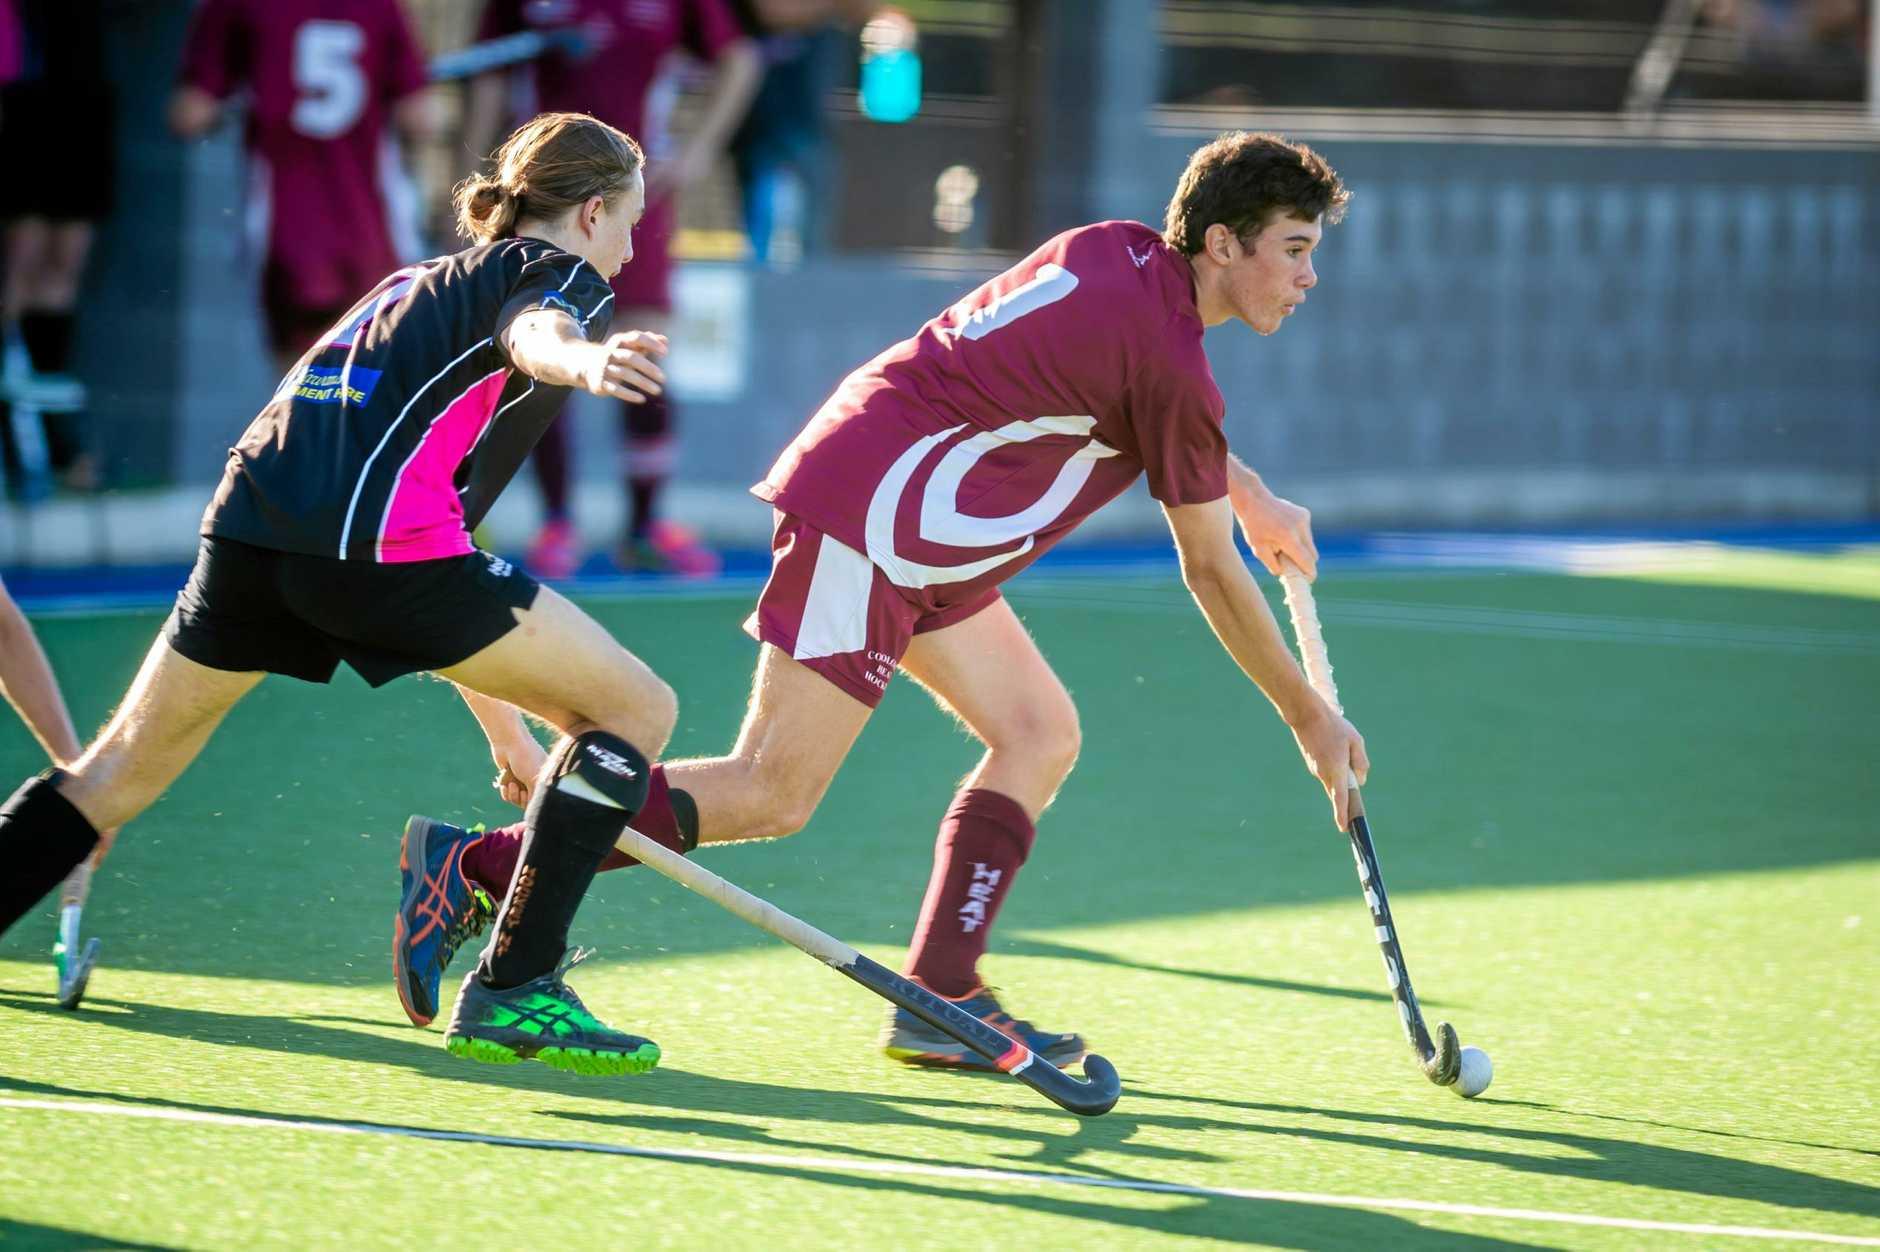 Hockey - Cooloola Heat vs Buderim - Matthew Browne Heat